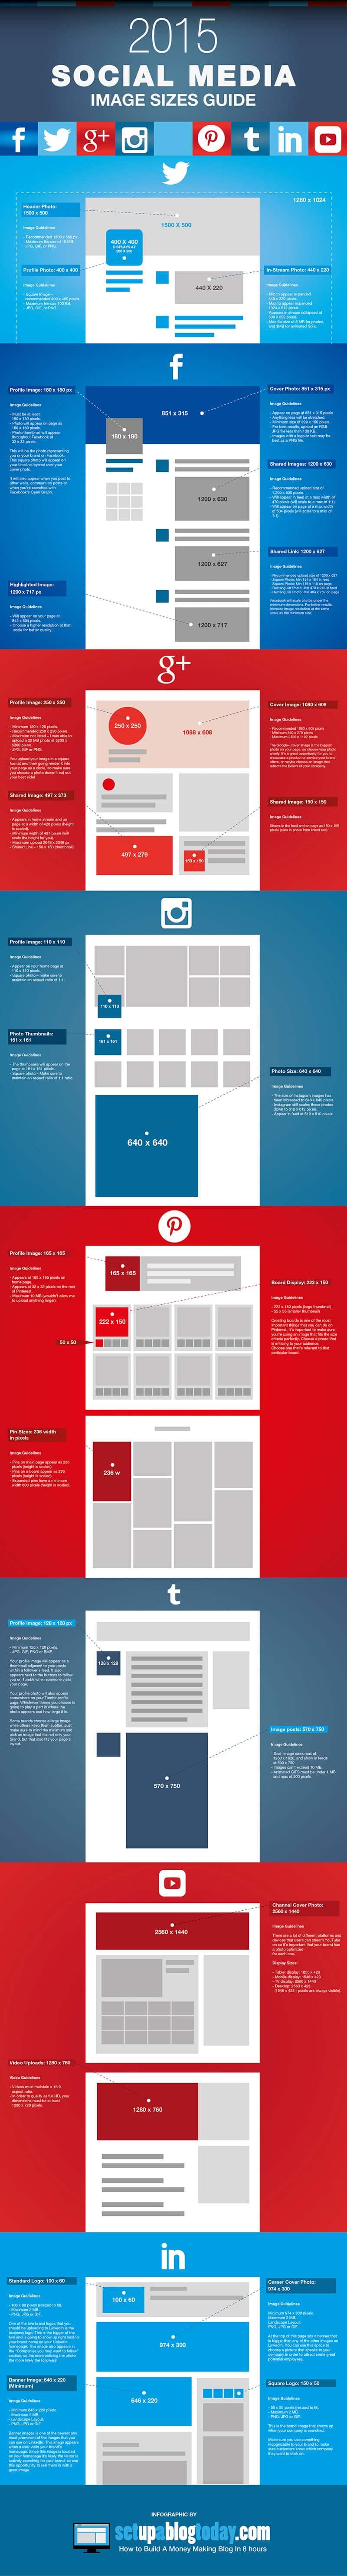 Social media image sizes infographic 2015